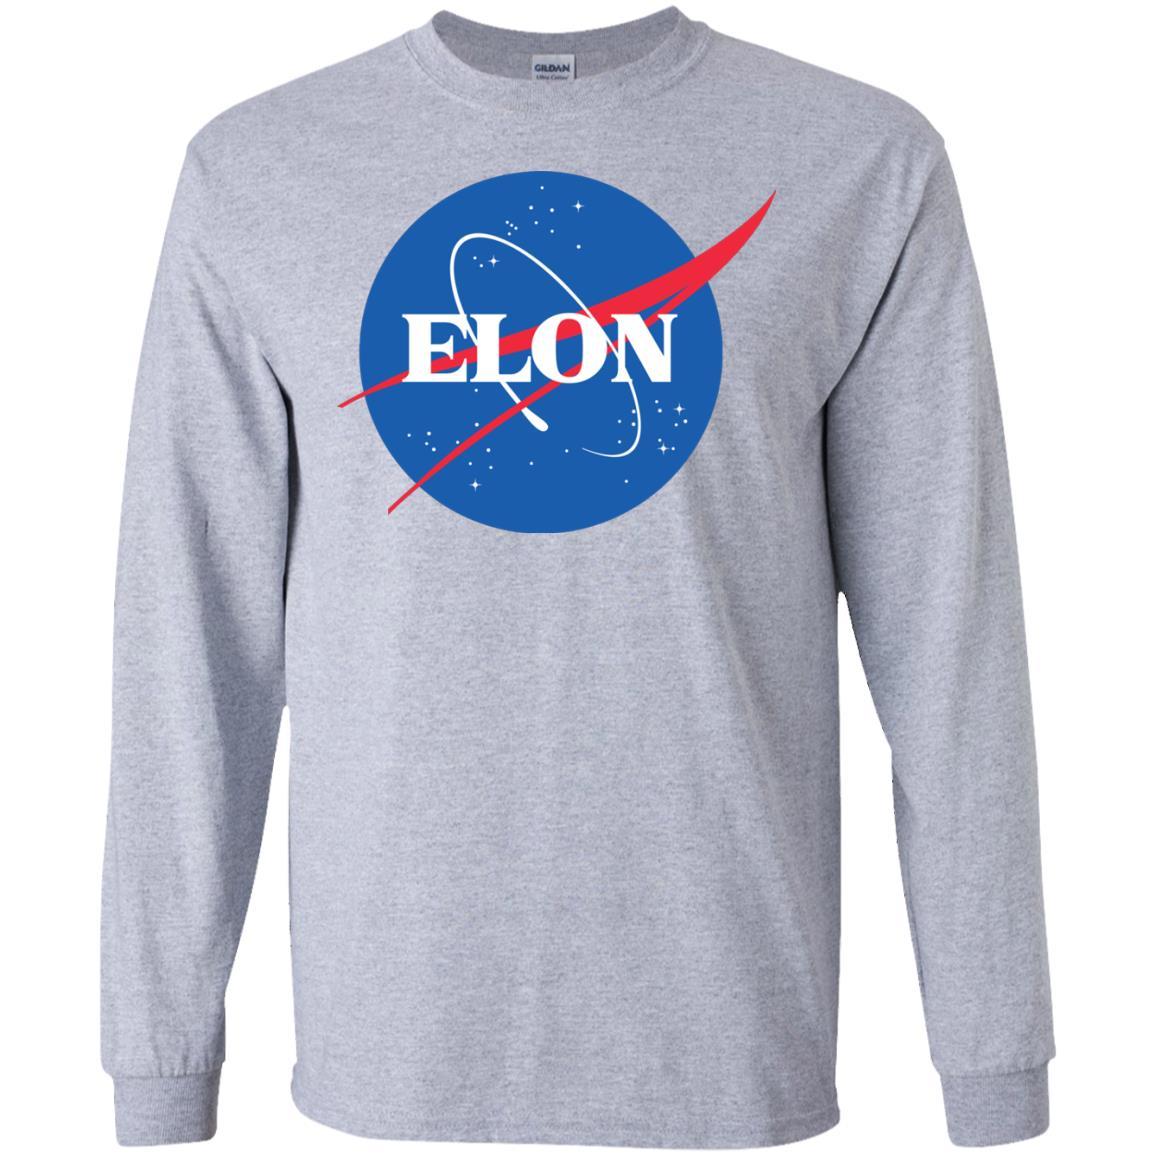 image 285px Elon Nasa parody t shirt, hoodies, tank top